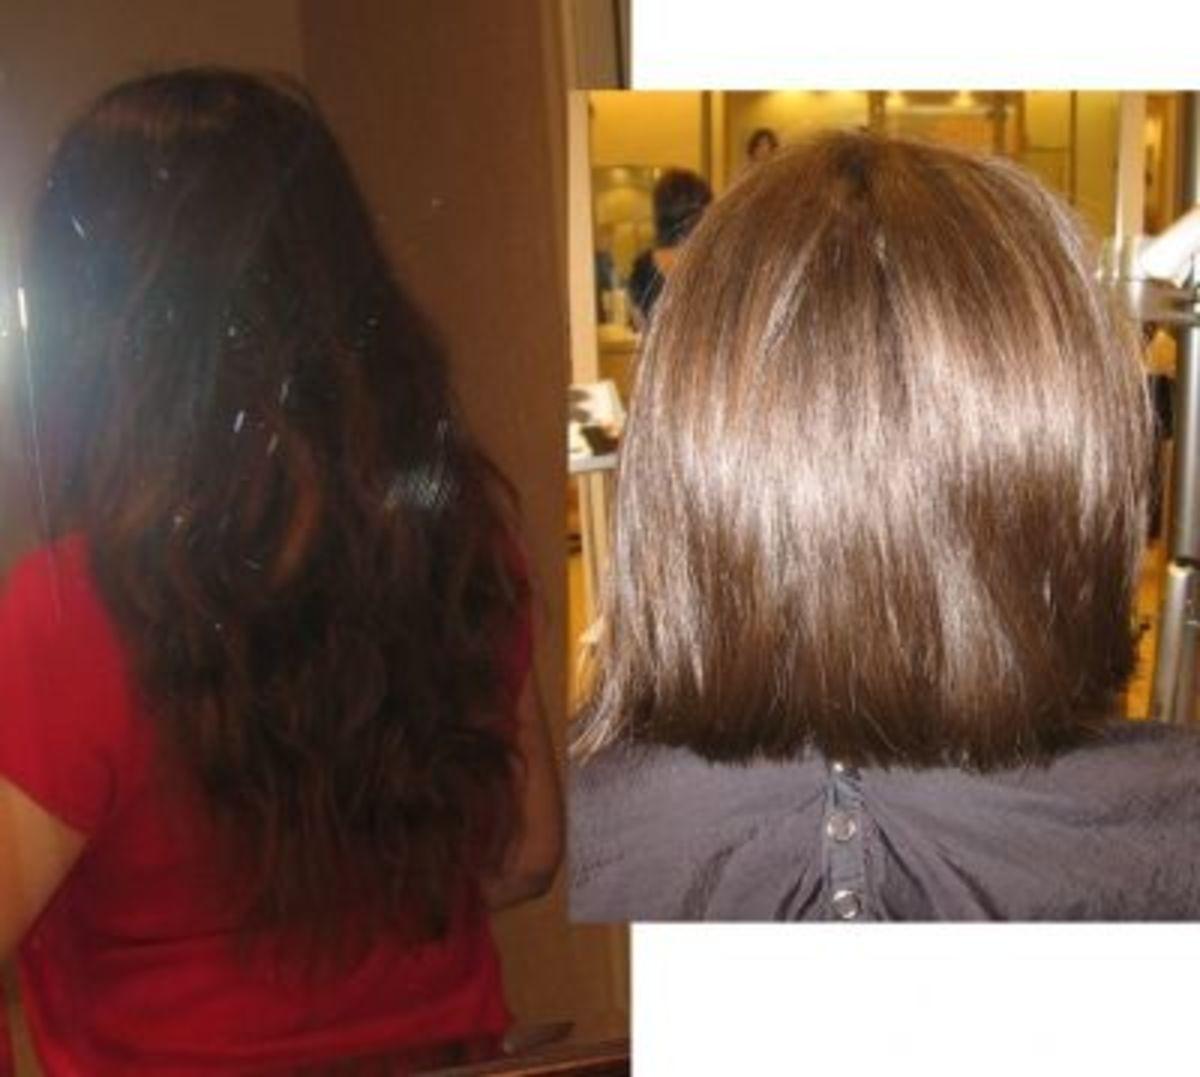 Made the cut May 24! Looking forward to enjoying short hair for the summer!